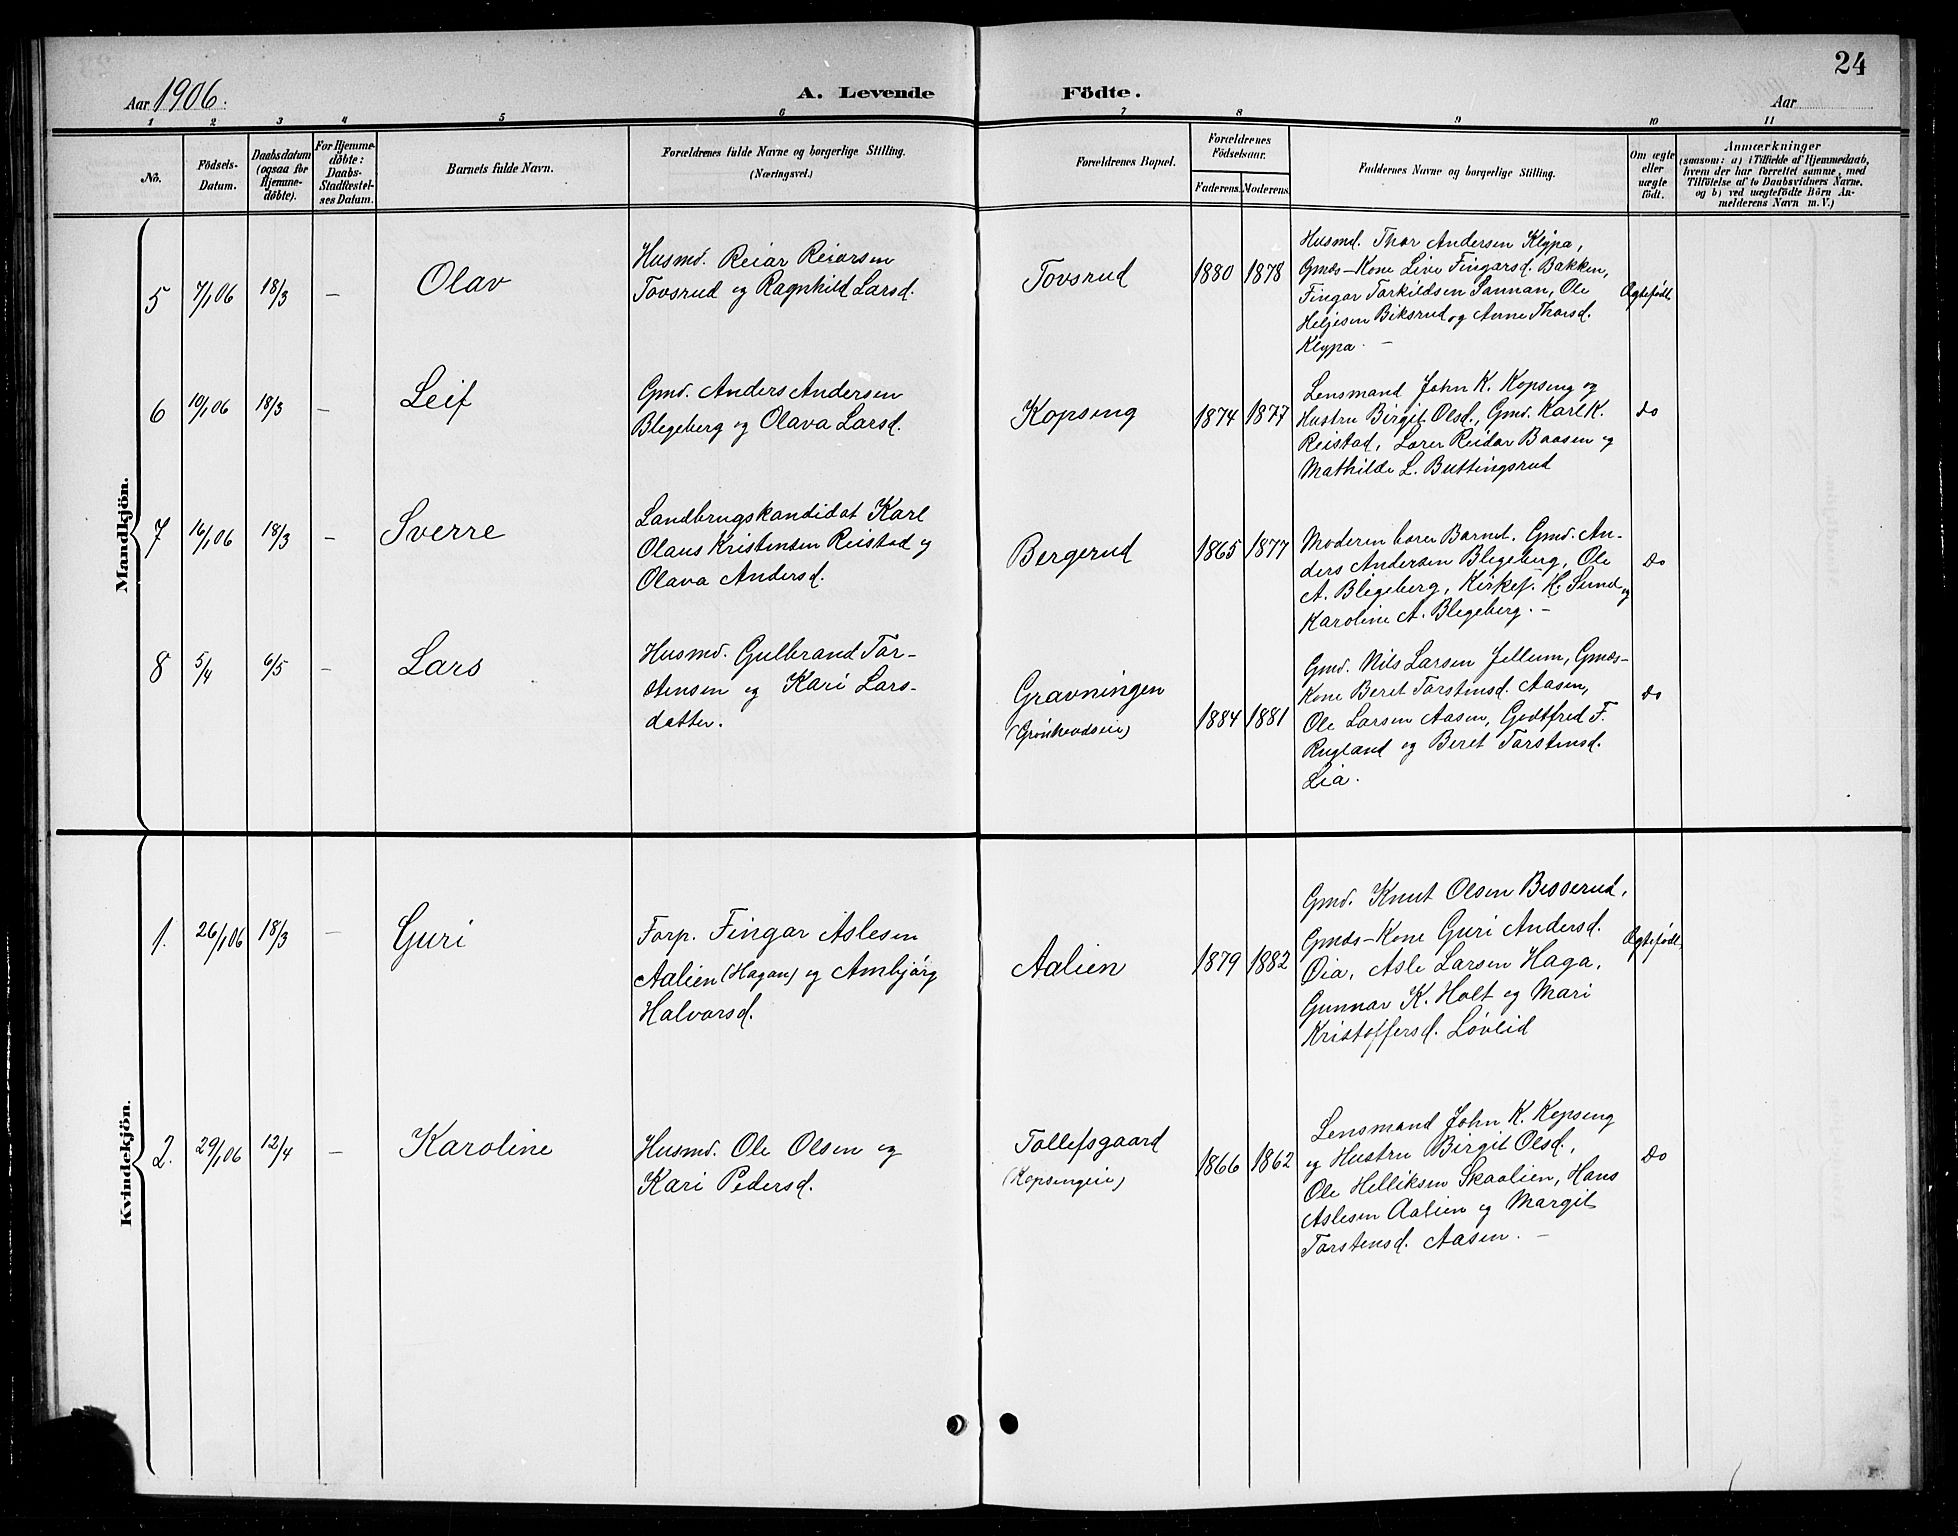 SAKO, Sigdal kirkebøker, G/Gb/L0003: Klokkerbok nr. II 3, 1901-1916, s. 24